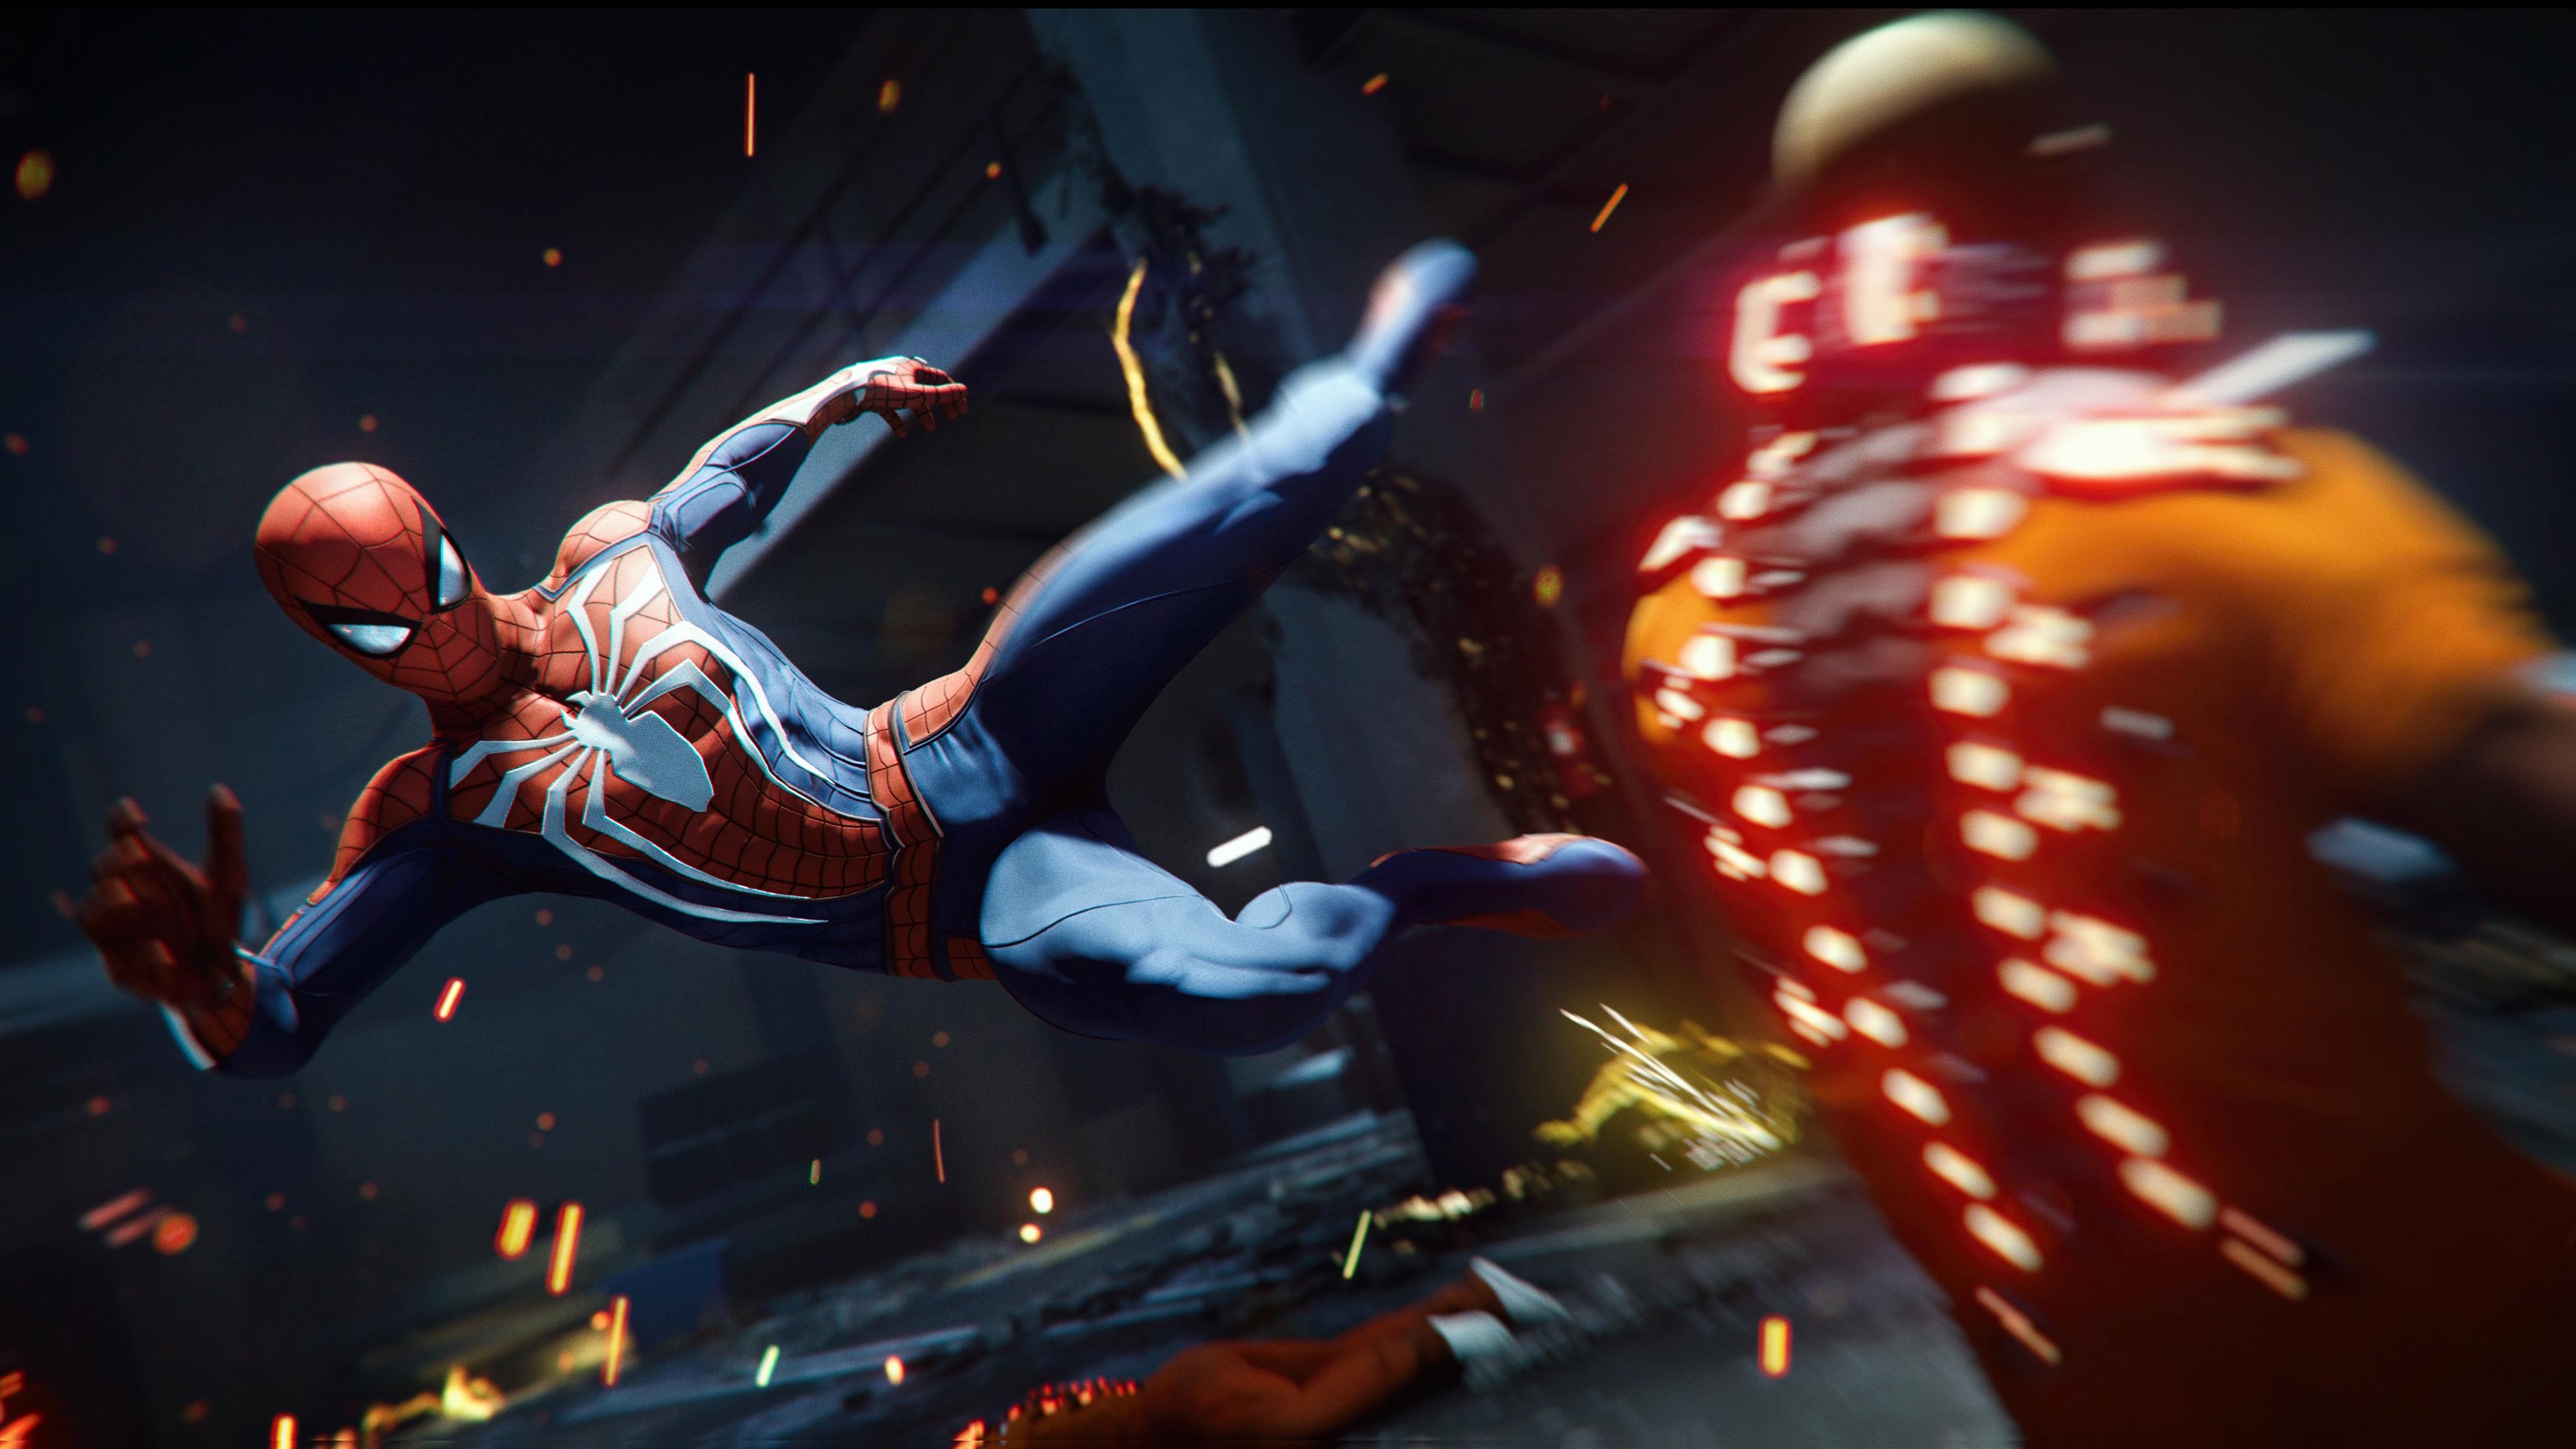 spiderman-ps4-x20.jpg